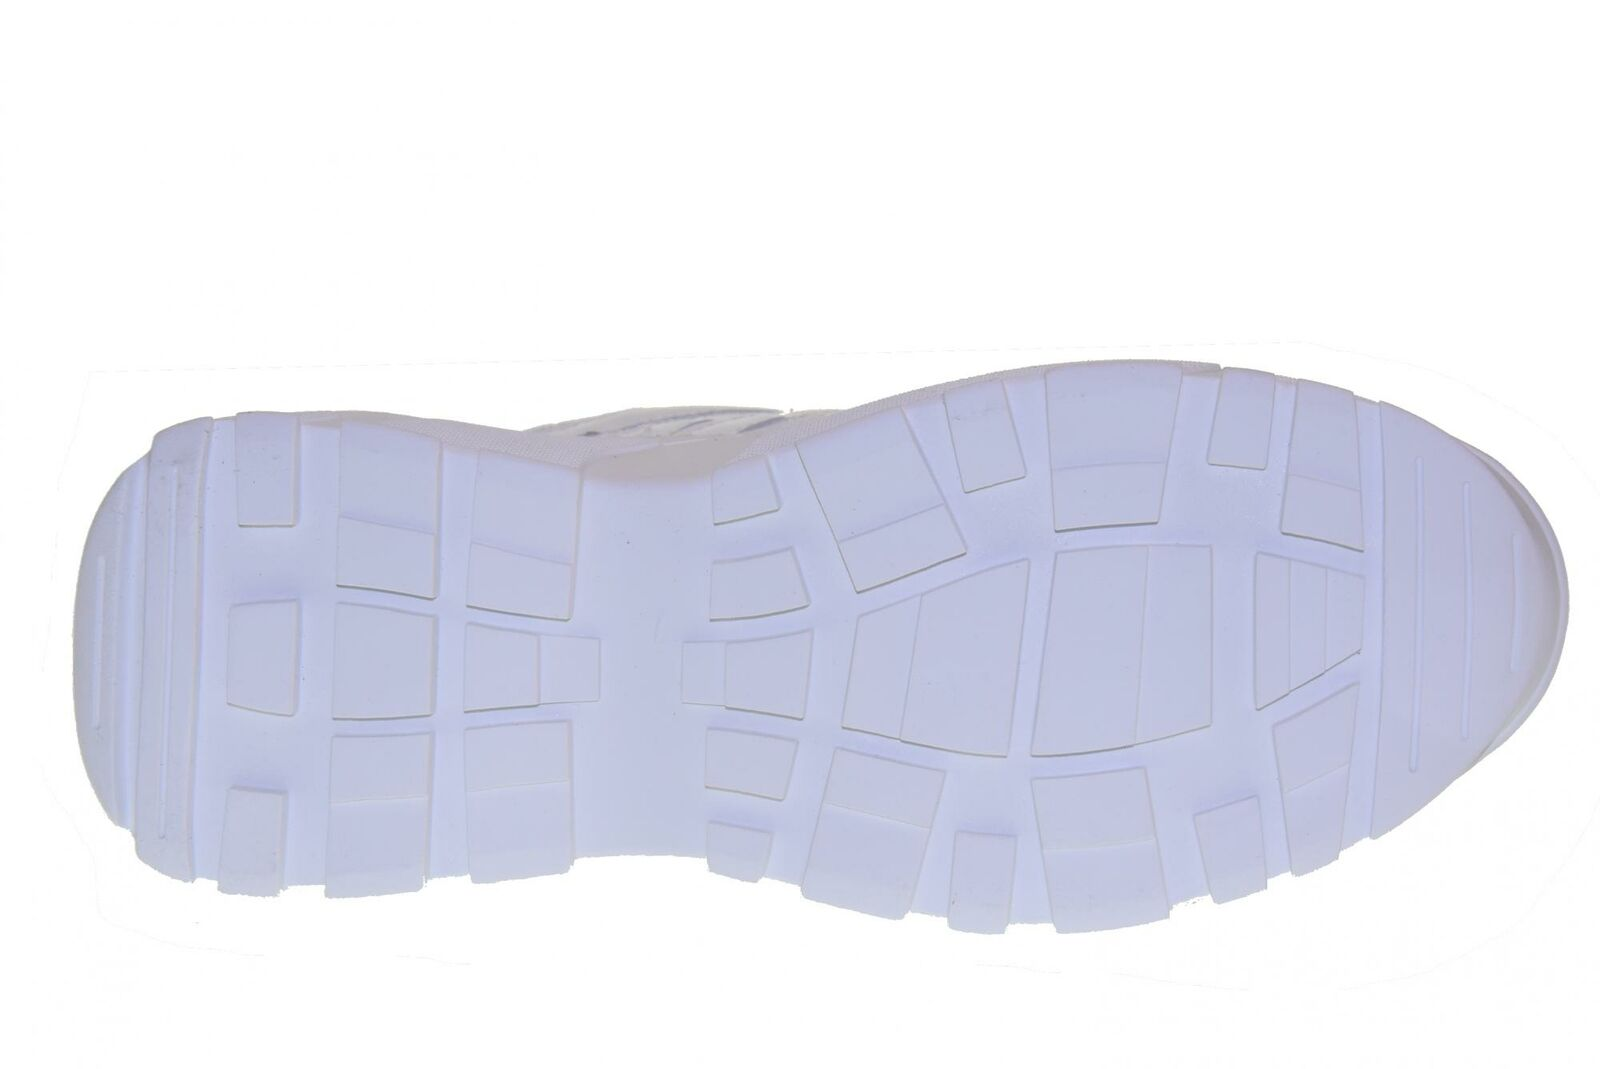 Windsor Windsor Windsor Smith P19s schuhe damen zapatillas con cuña COREY BIANCO b9f705